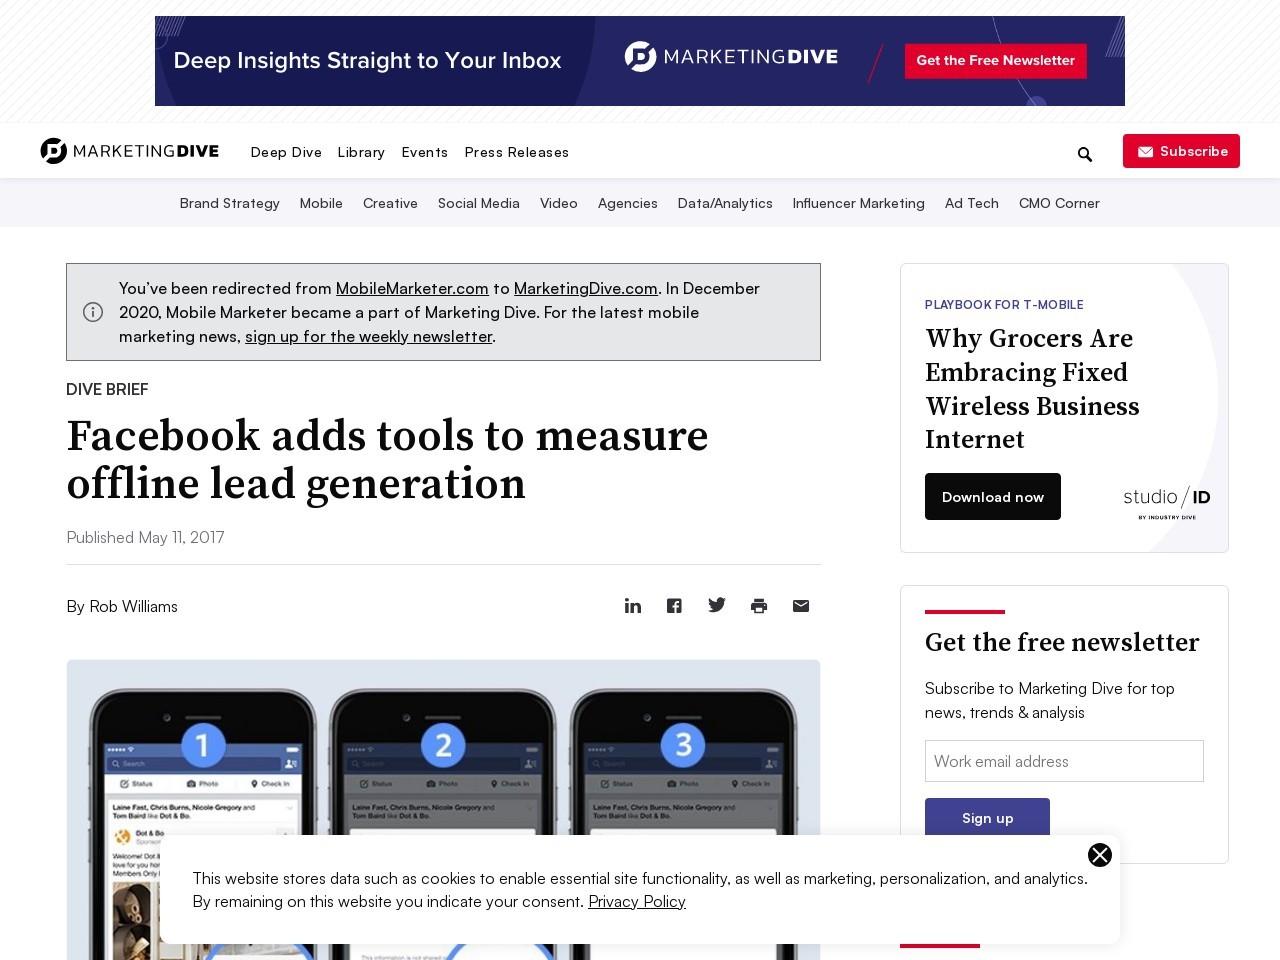 Facebook adds tools to measure offline lead generation